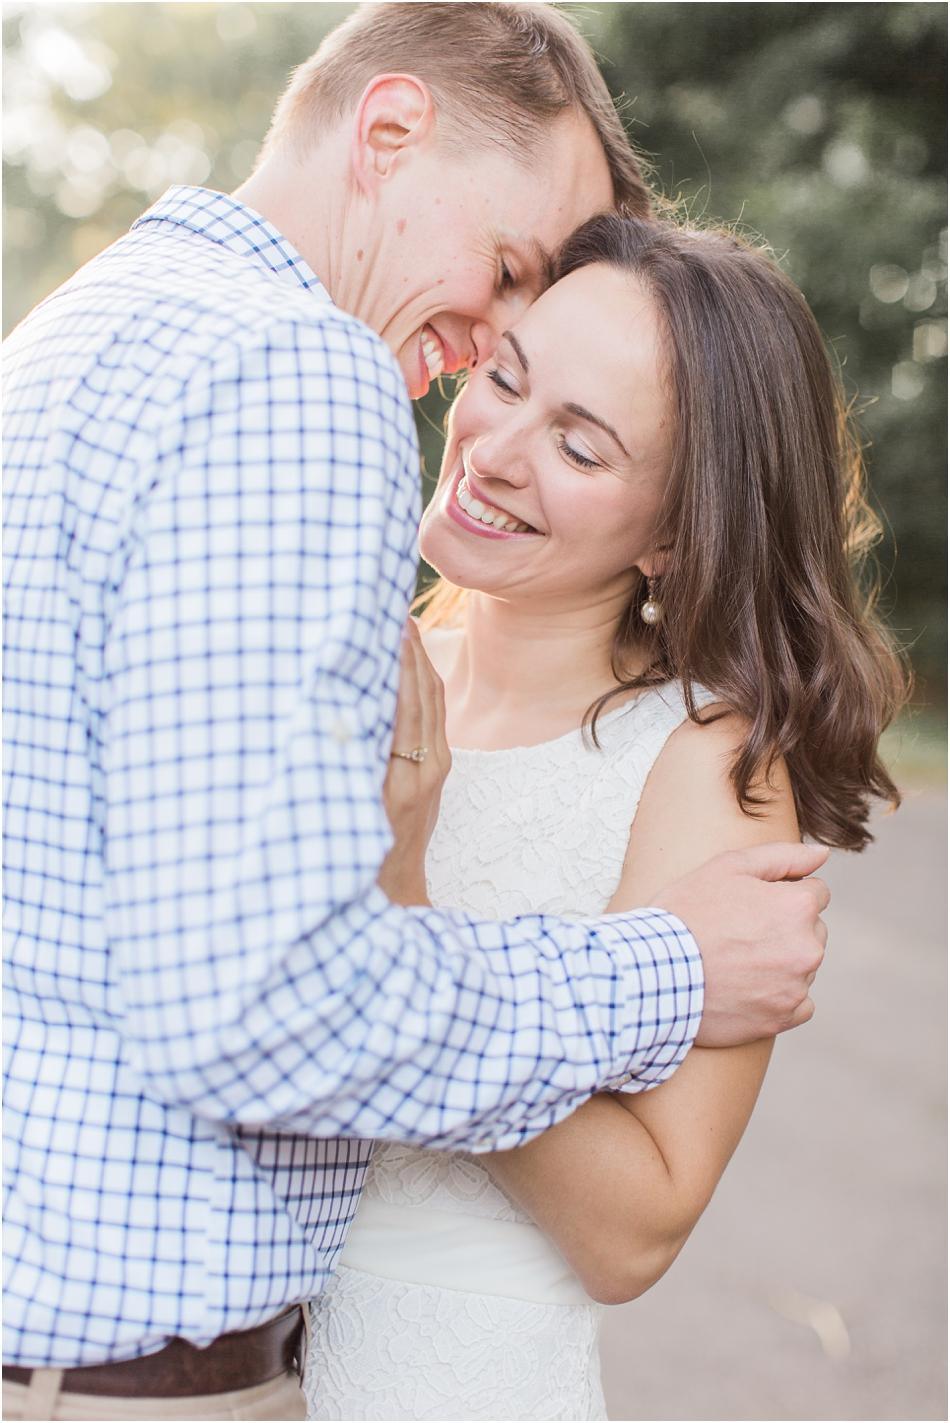 arnold_arboretum_engagement_dylan_mariana_cape_cod_boston_new_england_wedding_photographer_Meredith_Jane_Photography_photo_2660.jpg